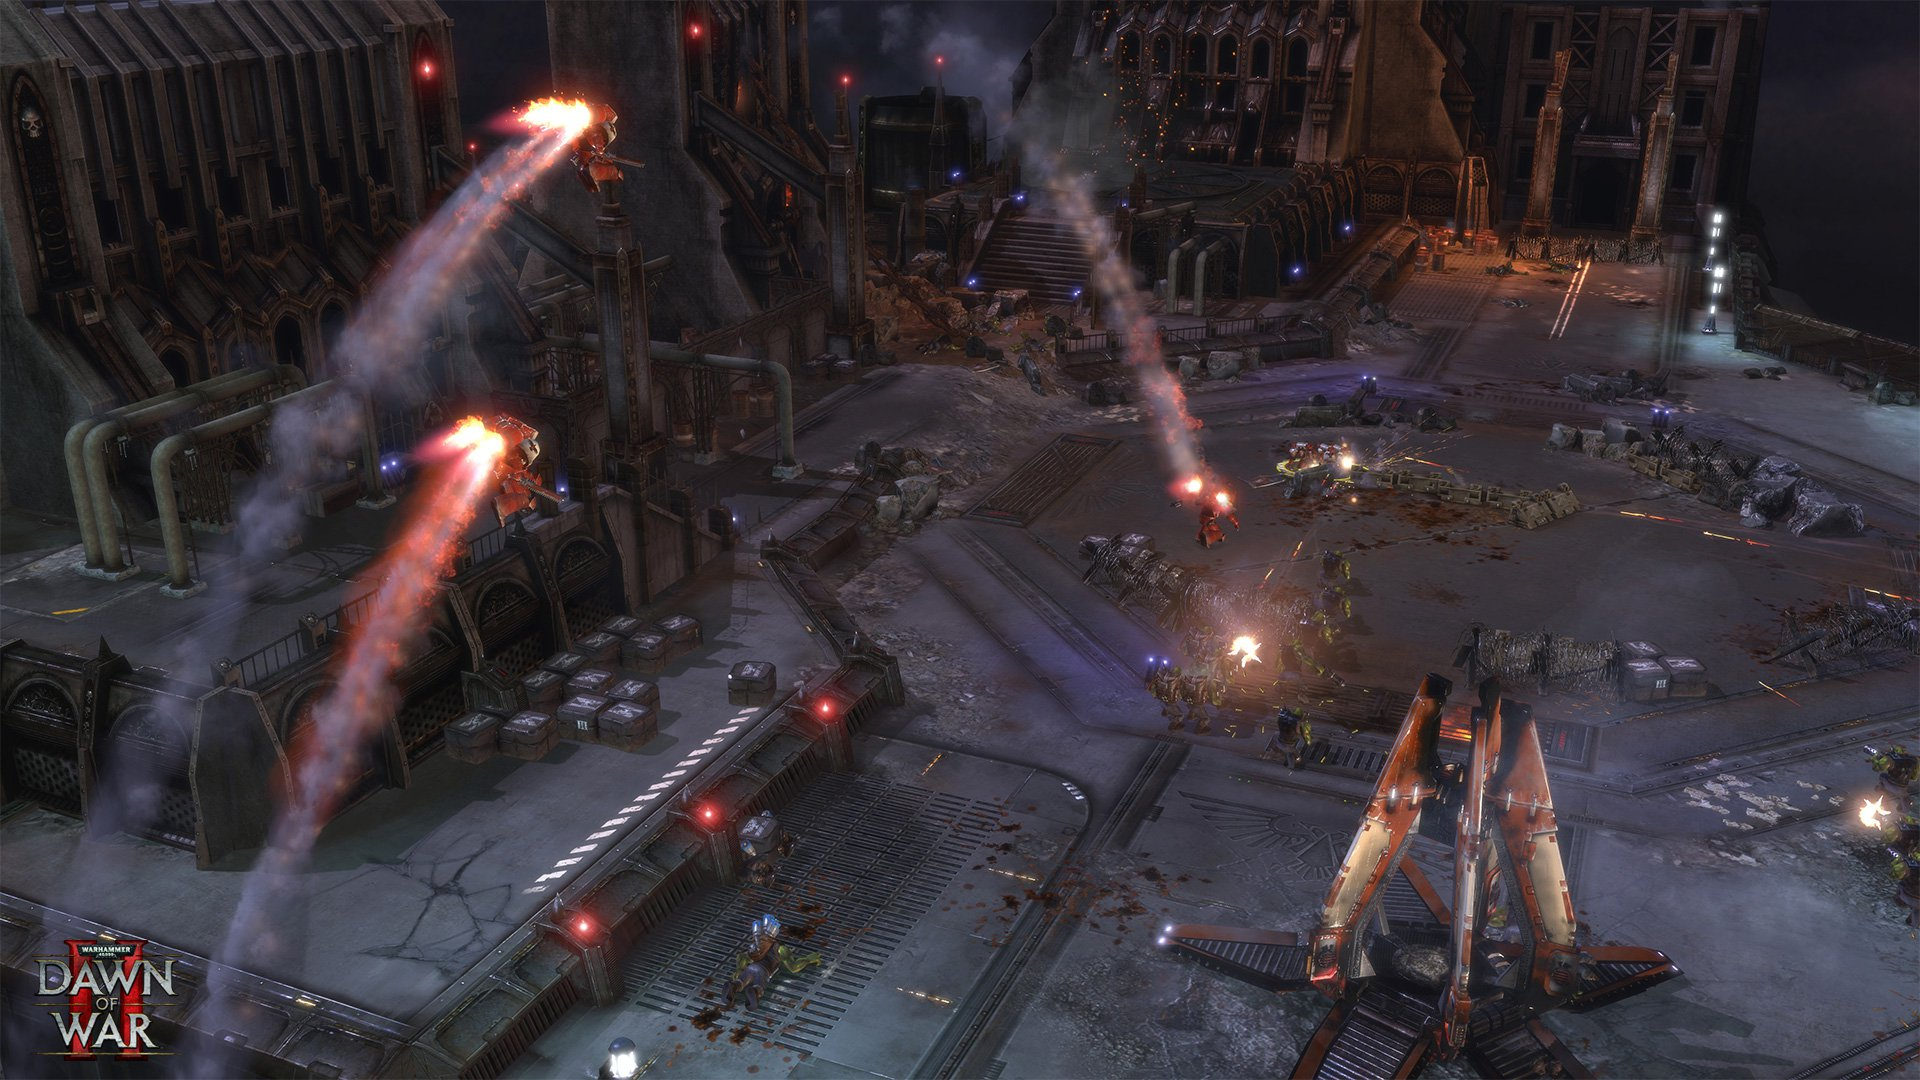 Warhammer 40,000 Dawn Of War 4